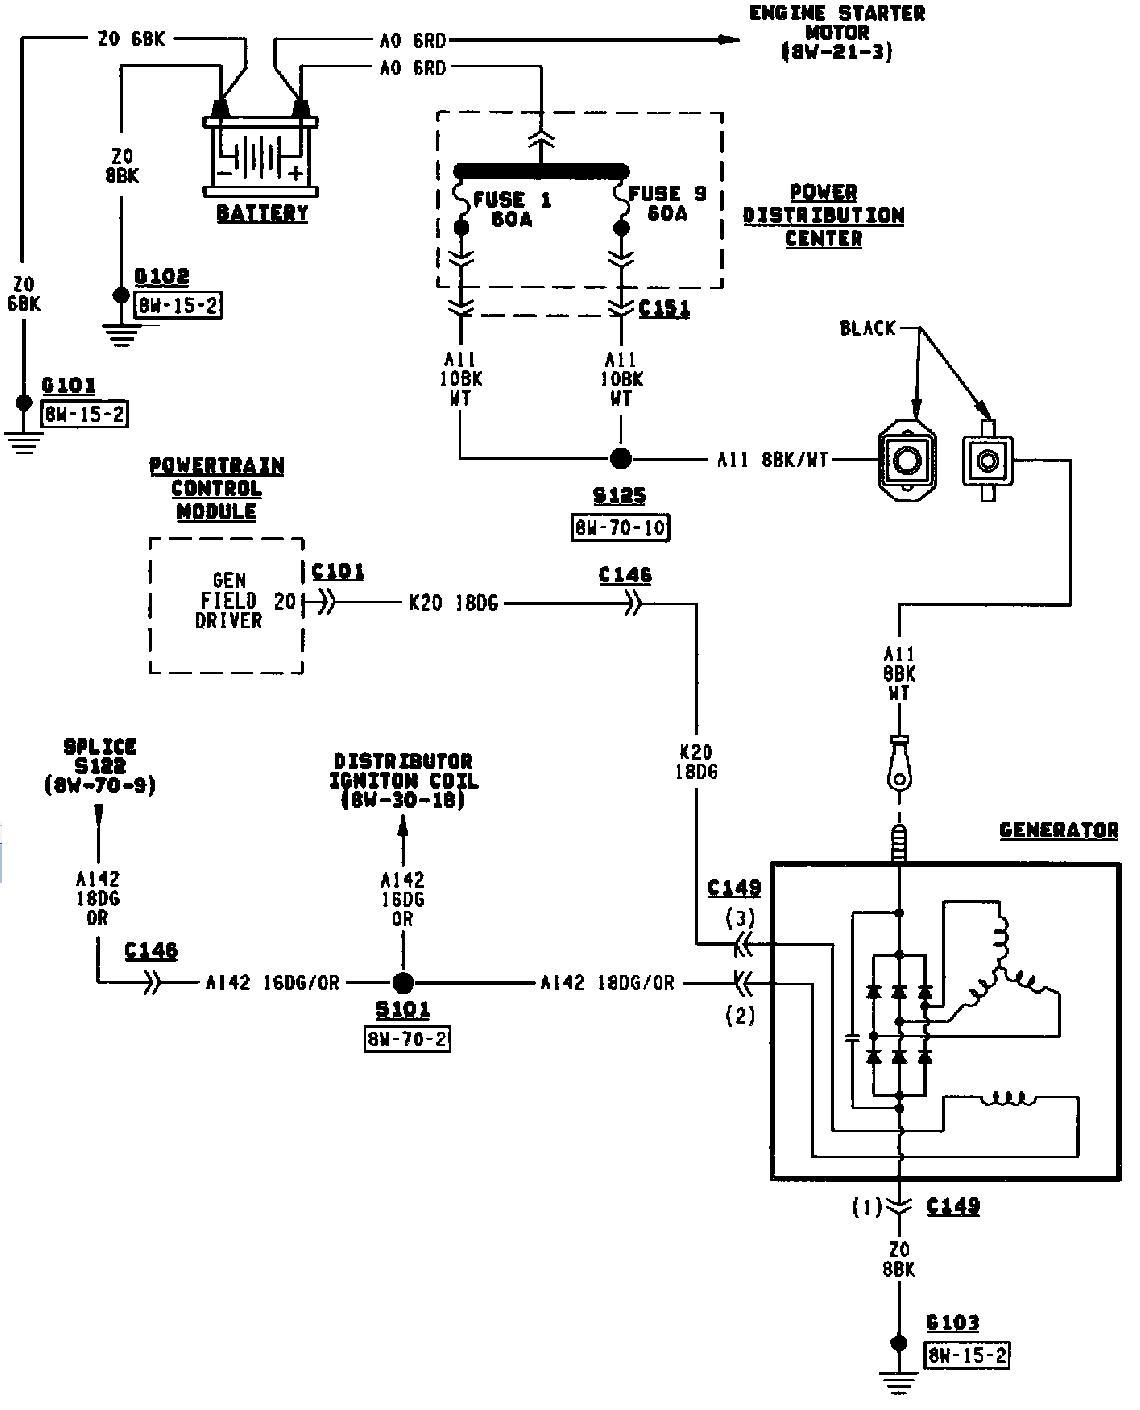 diagrama de cableado sistema electrico  u2013 ais3d